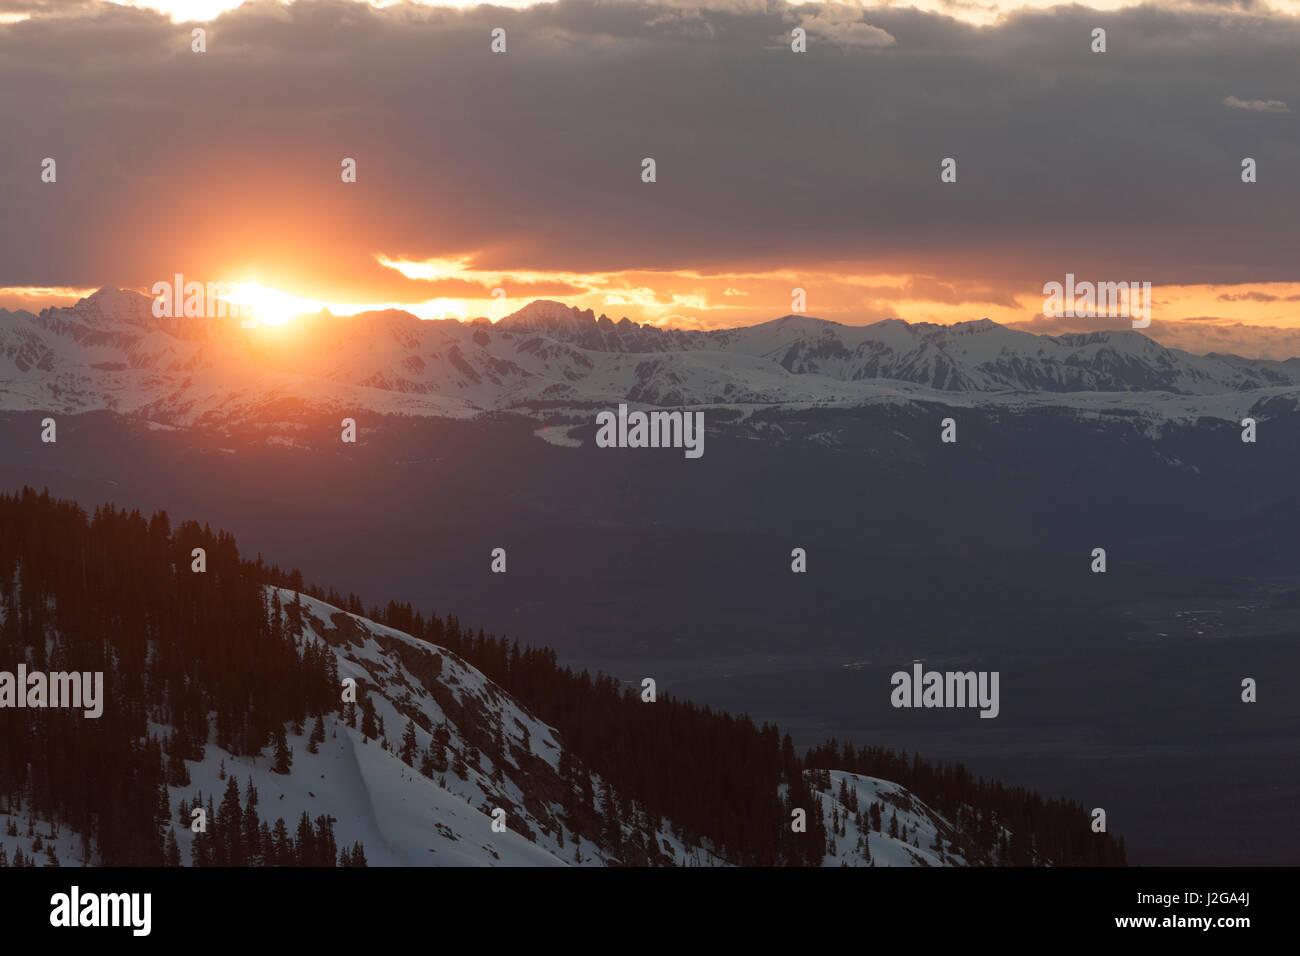 USA, Colorado. Sunset over the Elk Range. Credit as: Don Grall / Jaynes Gallery / DanitaDelimont.com - Stock Image